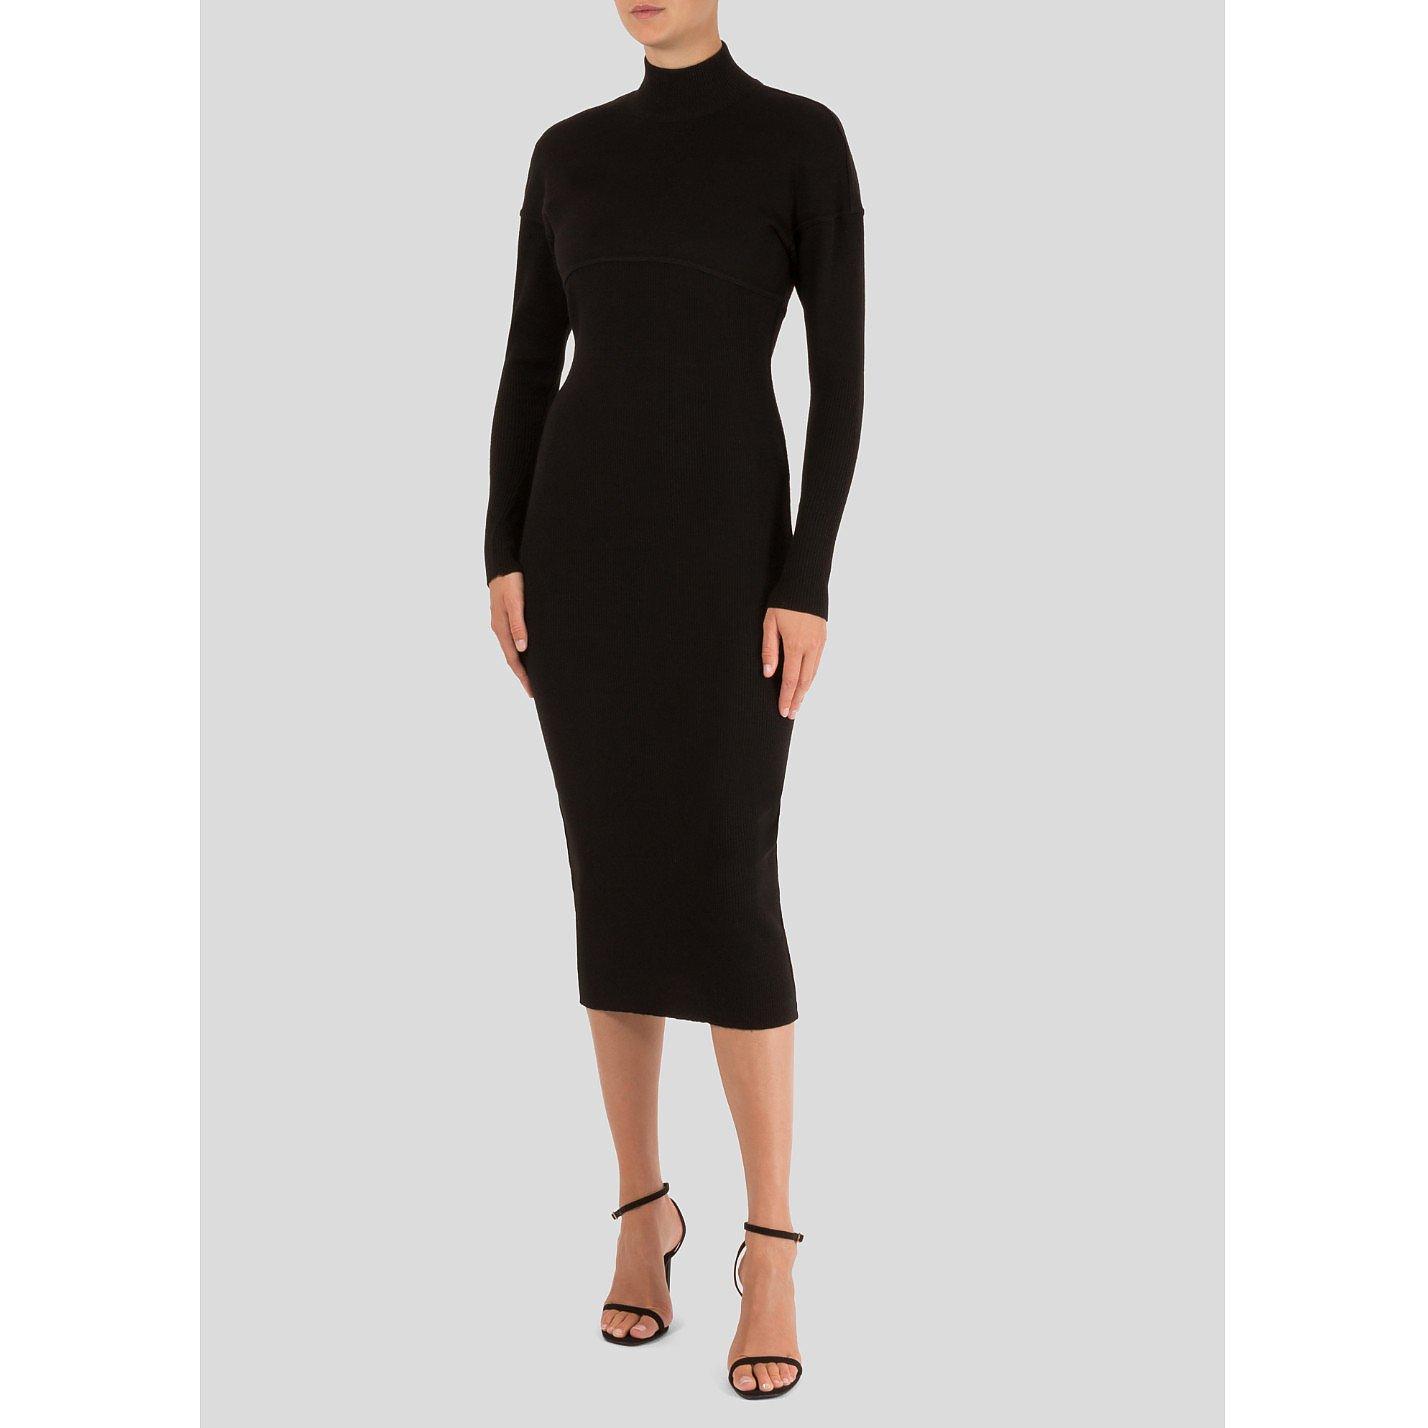 Alaïa High Neck Midi Knit Dress